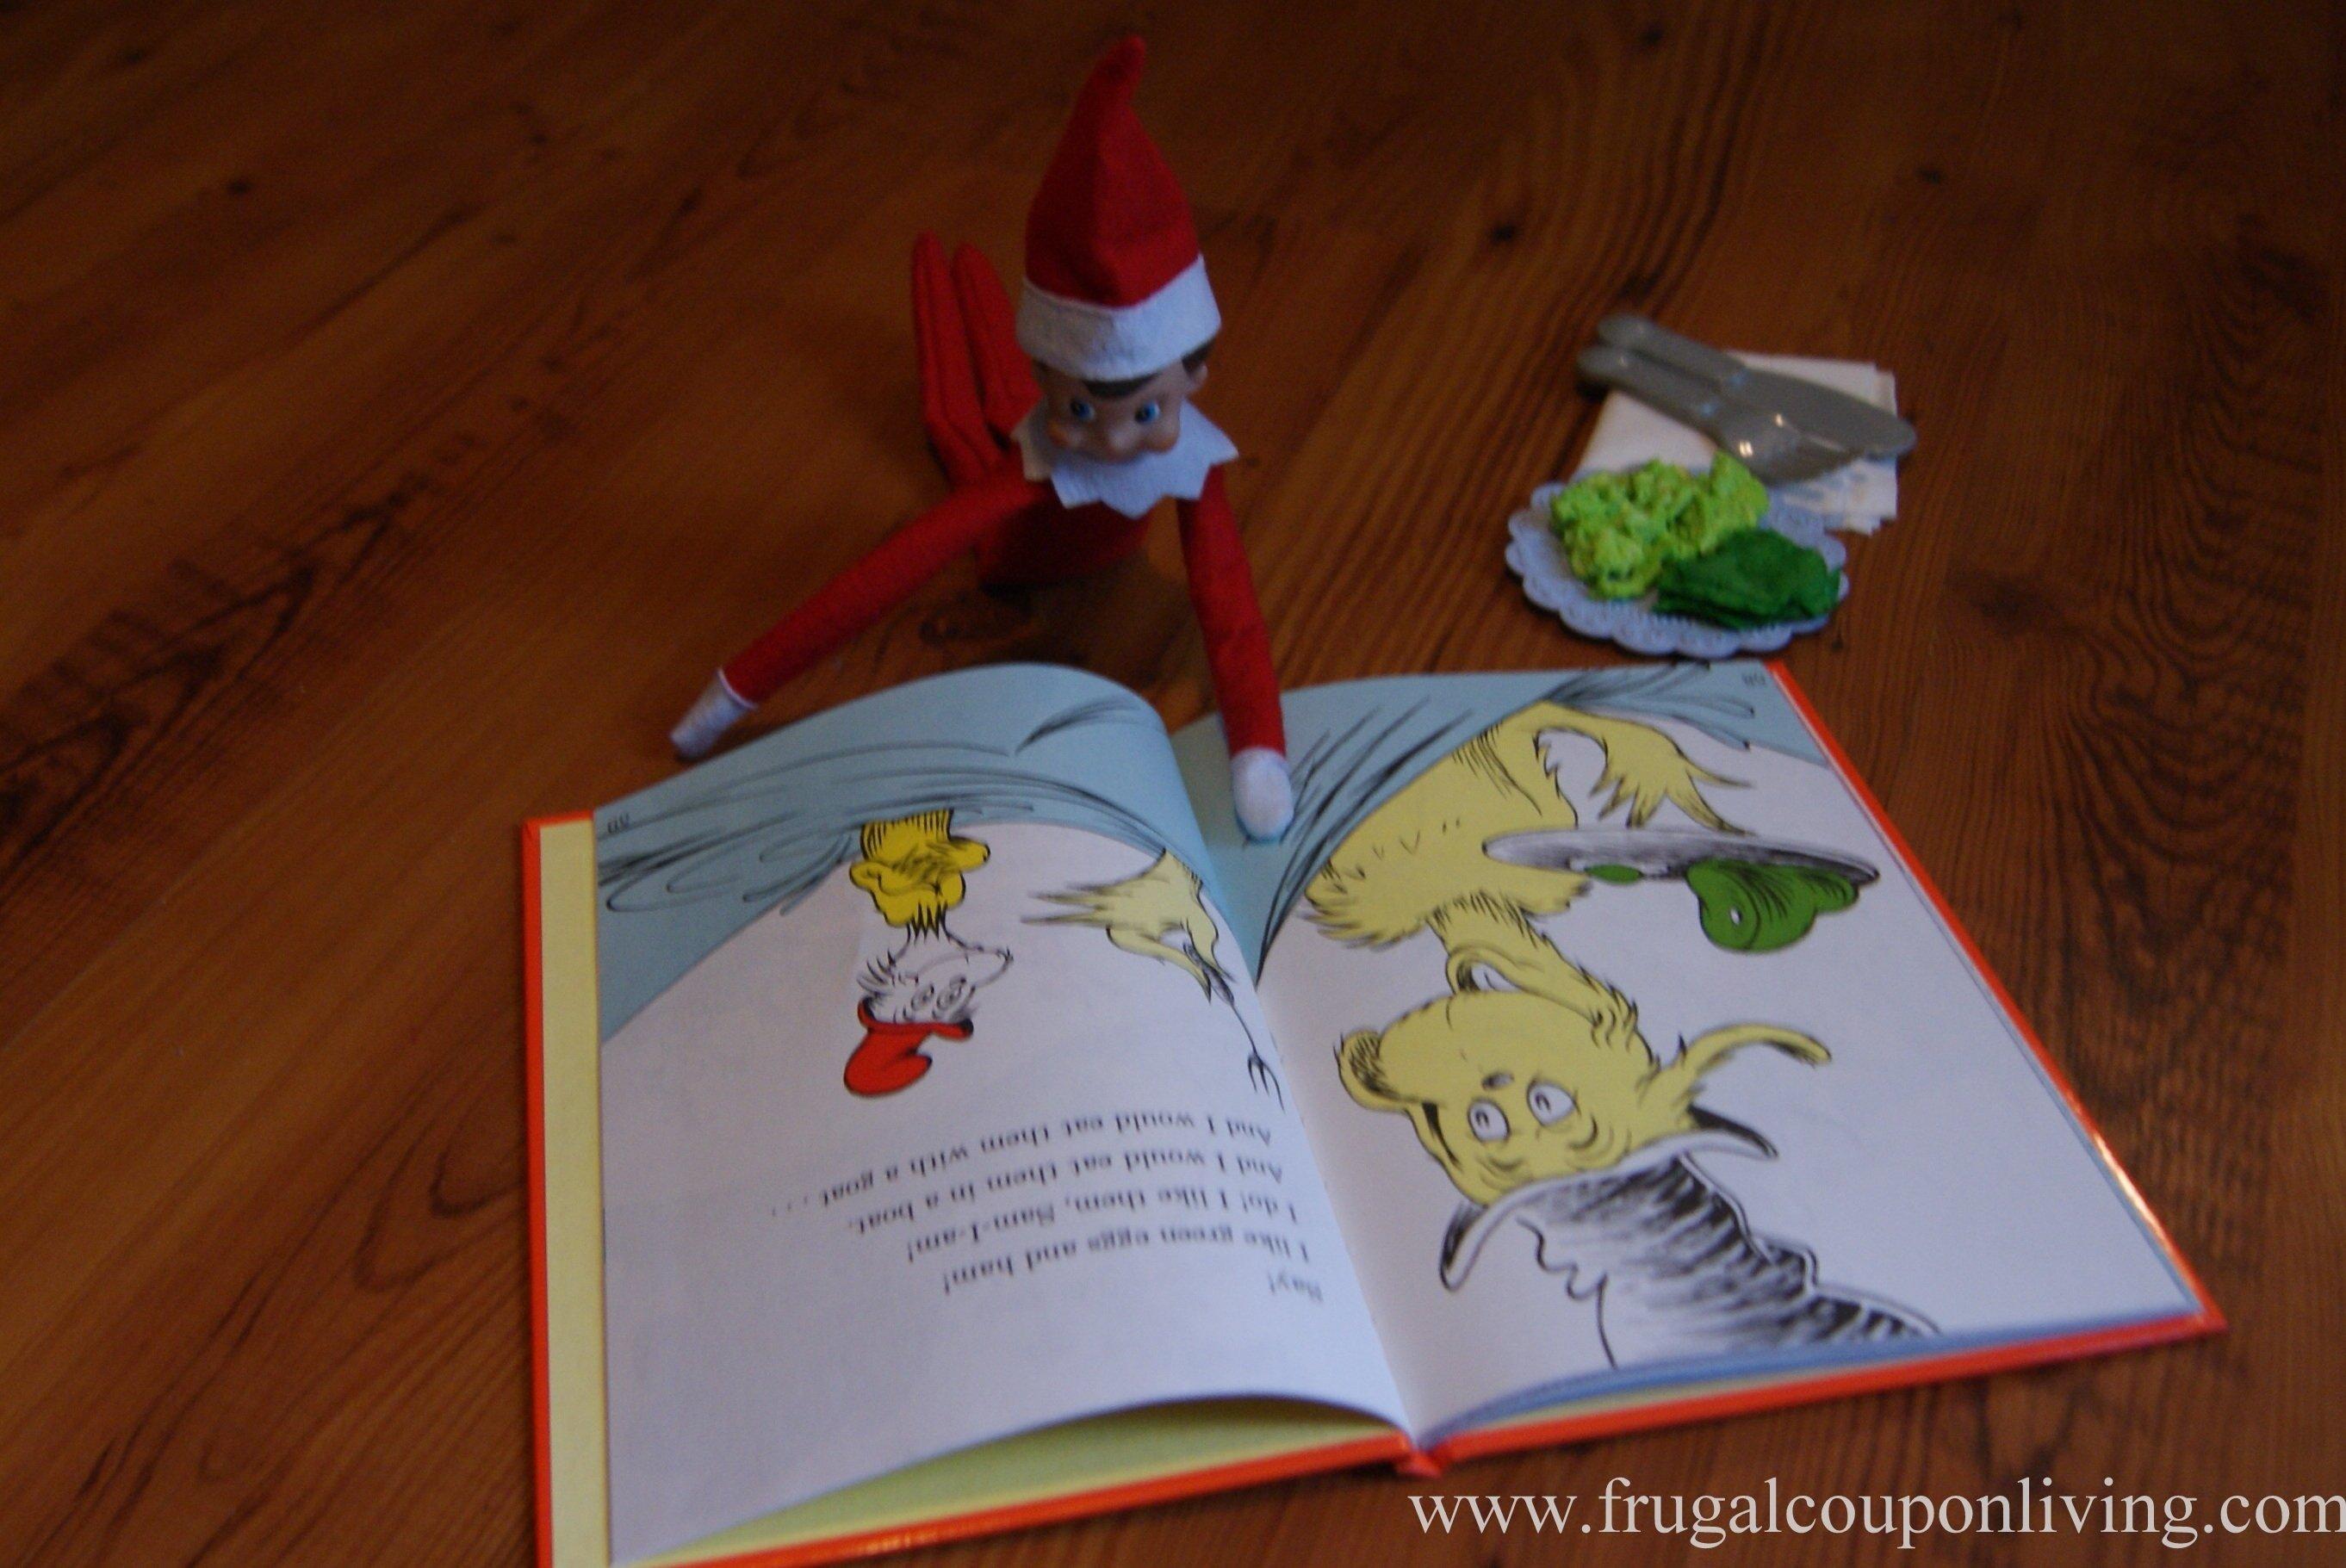 10 Elegant Pinterest Elf On The Shelf Ideas elf on the shelf ideas i do not like green eggs and ham 1 2020